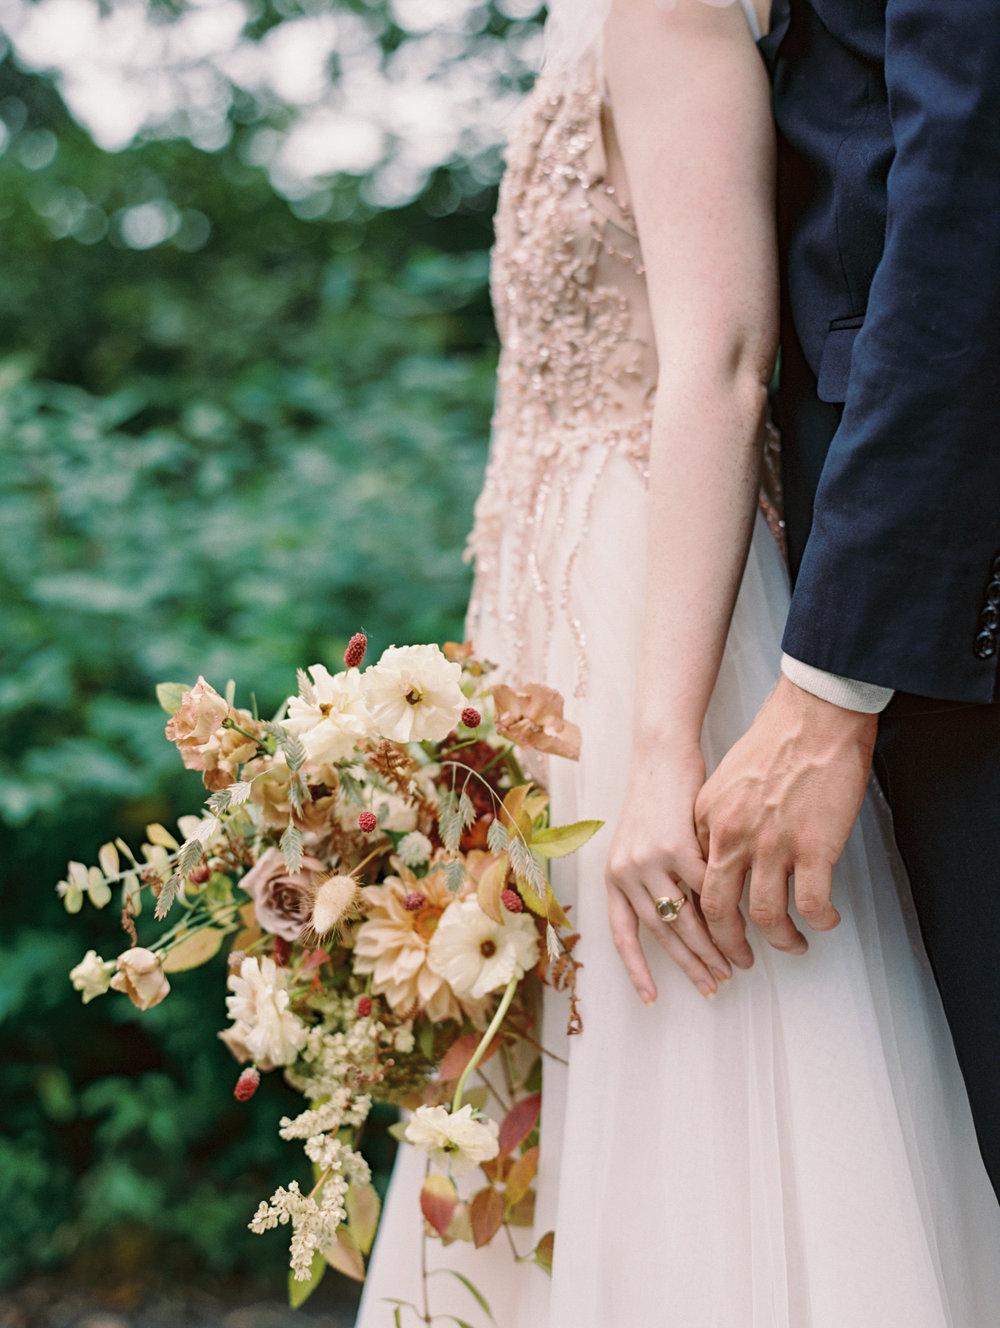 kelsandmichael_bridaleditorial_harvestelopement-27.jpg